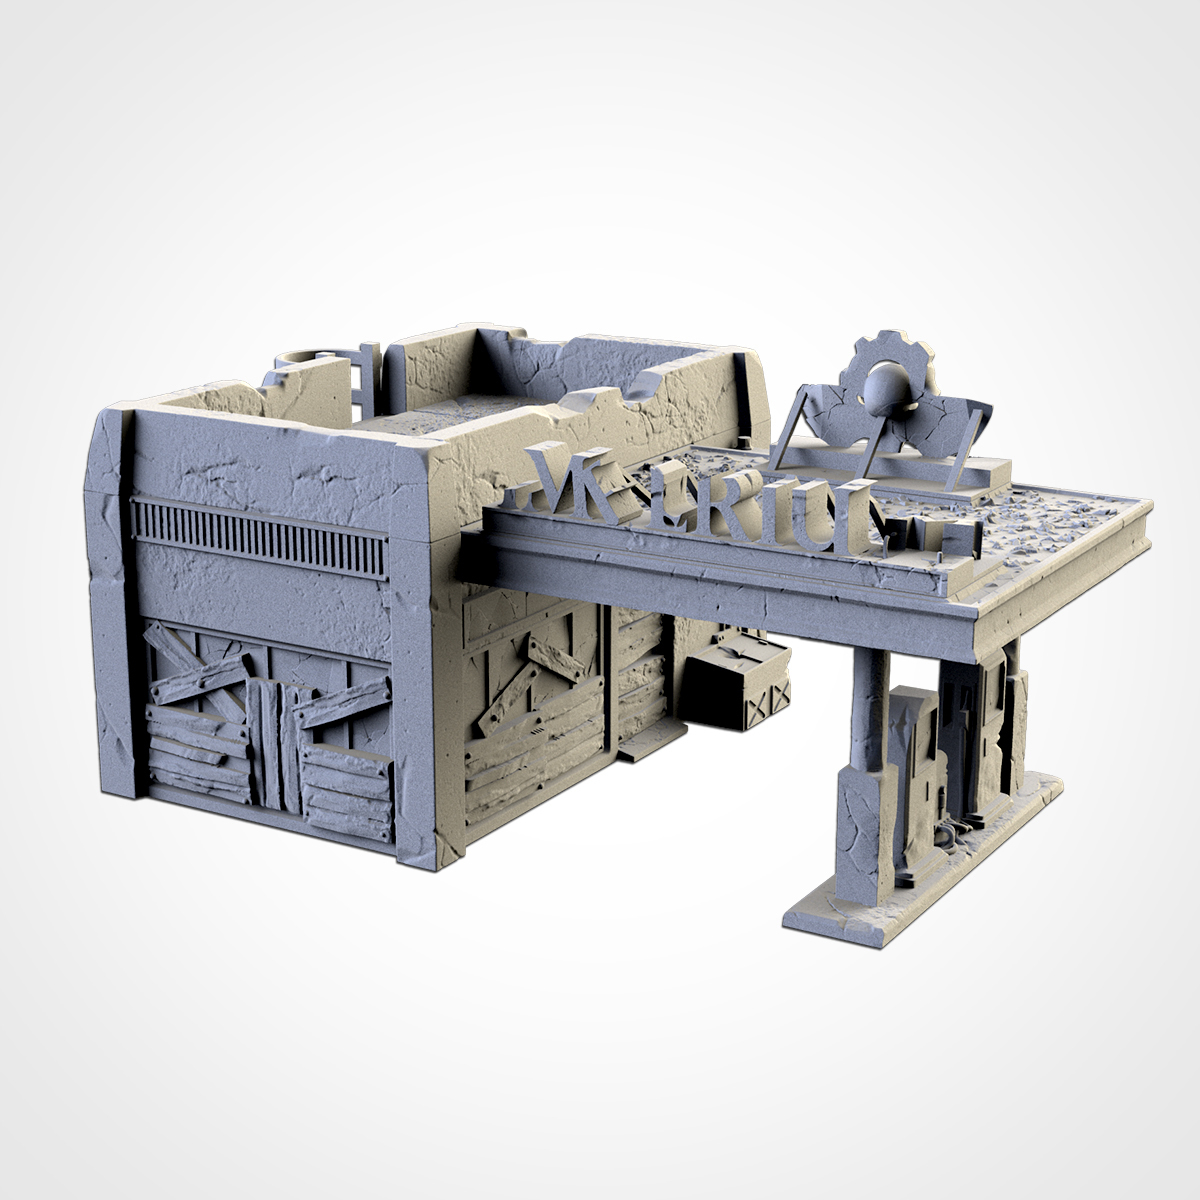 TXFA_WEB_GAS_ST_02.jpg Download STL file GAS STATION • 3D printing object, Txarli_Factory